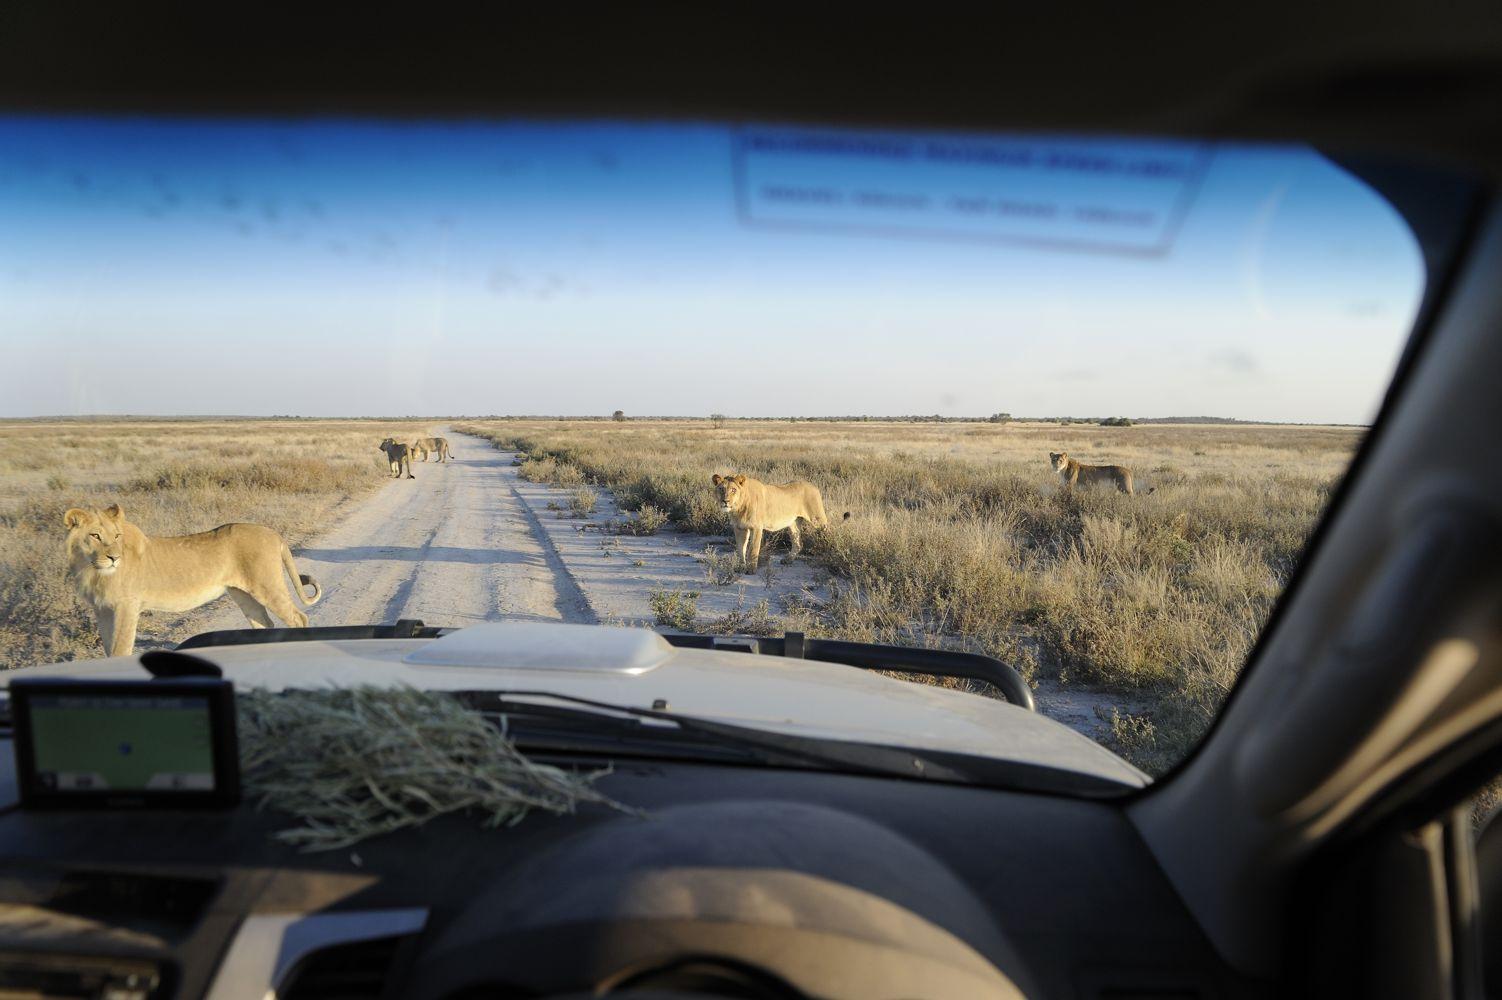 namibia2014-0662-thijsheslenfeldA_40_verkleind.jpg